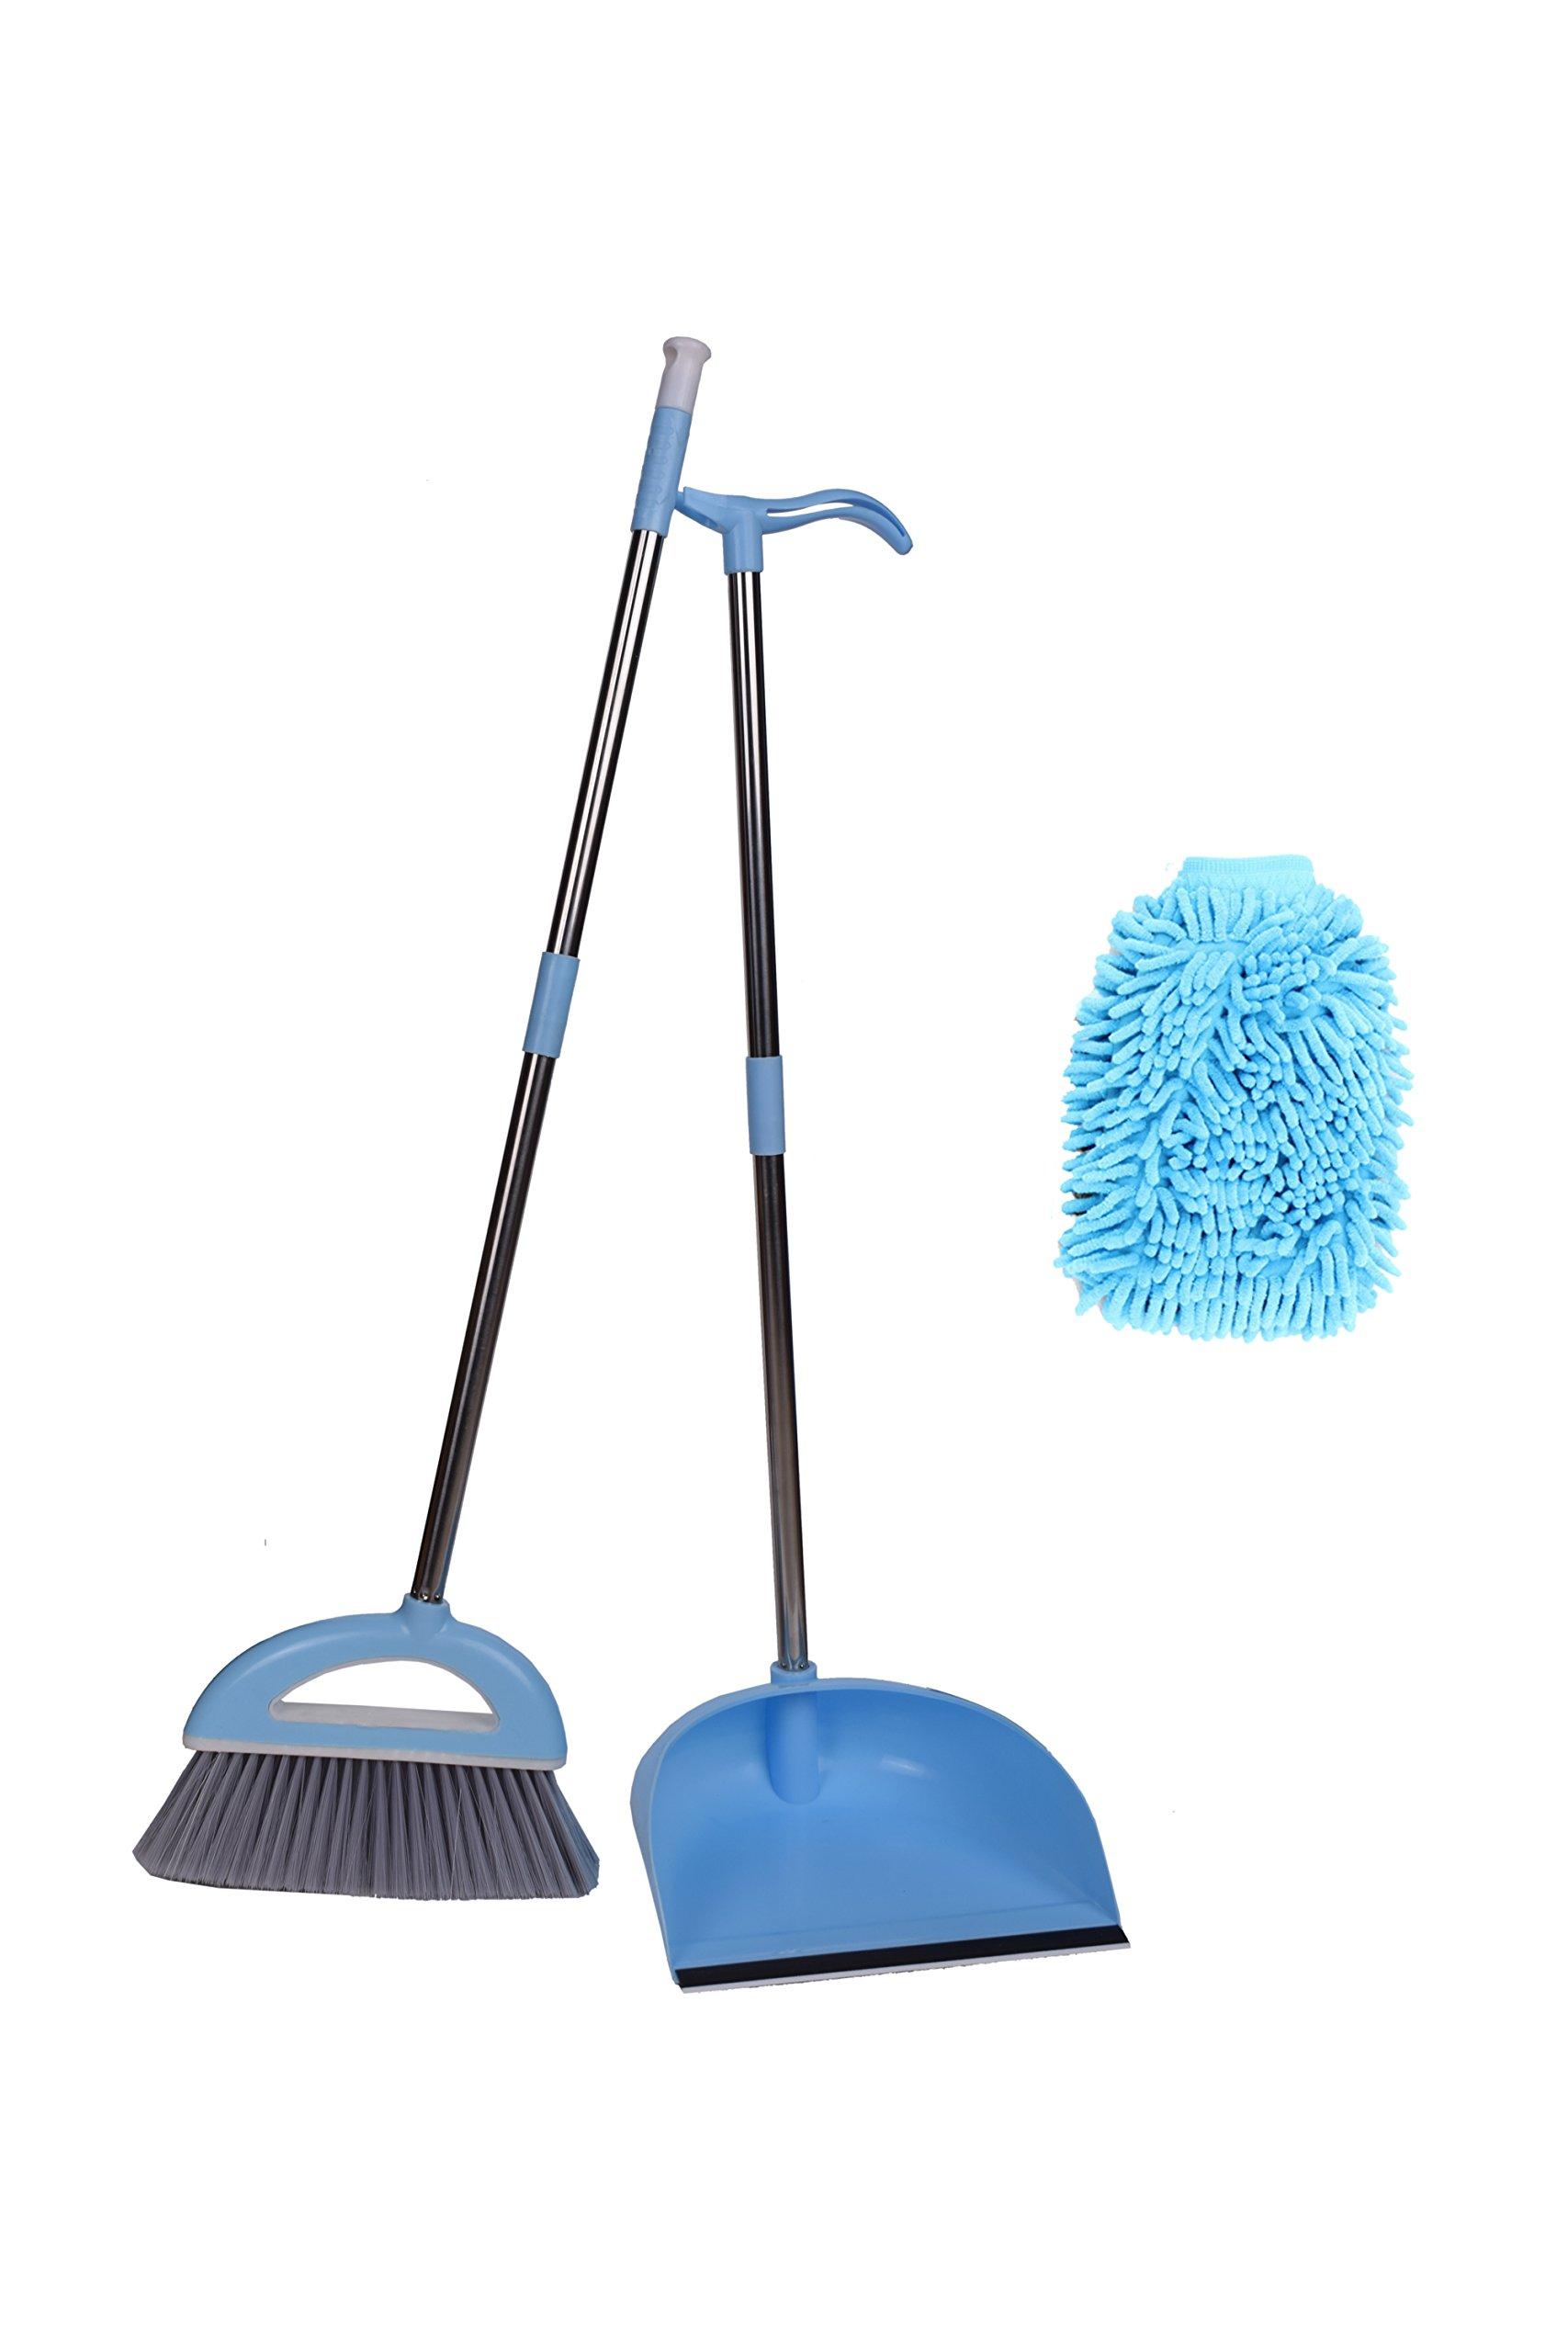 Xifando Good Grips Sweep Set, Broom&Dustpan&Cleaning Mitt